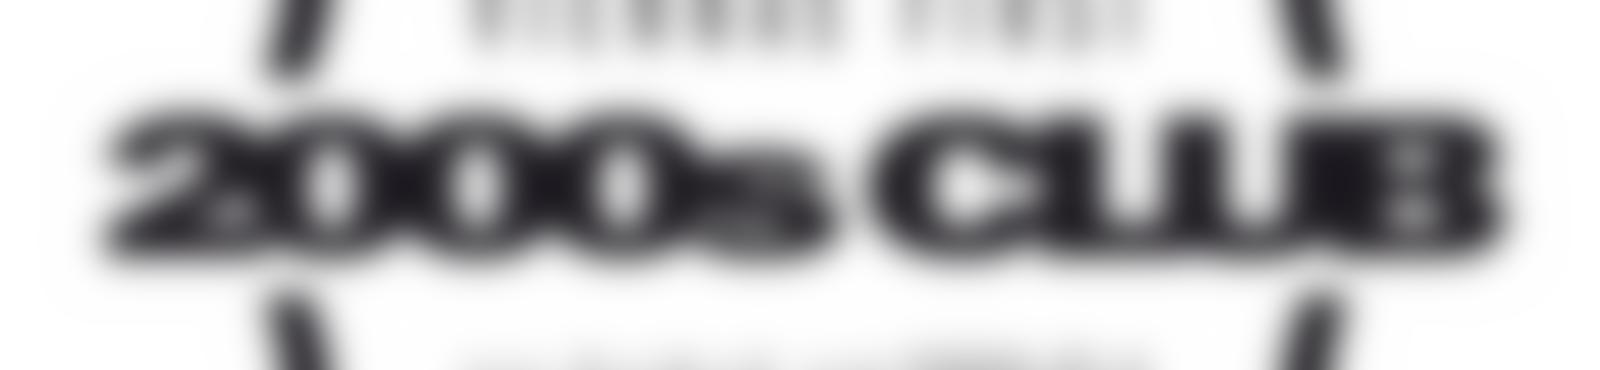 Blurred fac195d8 e06c 48b3 bd1c 661b68b7ec7e